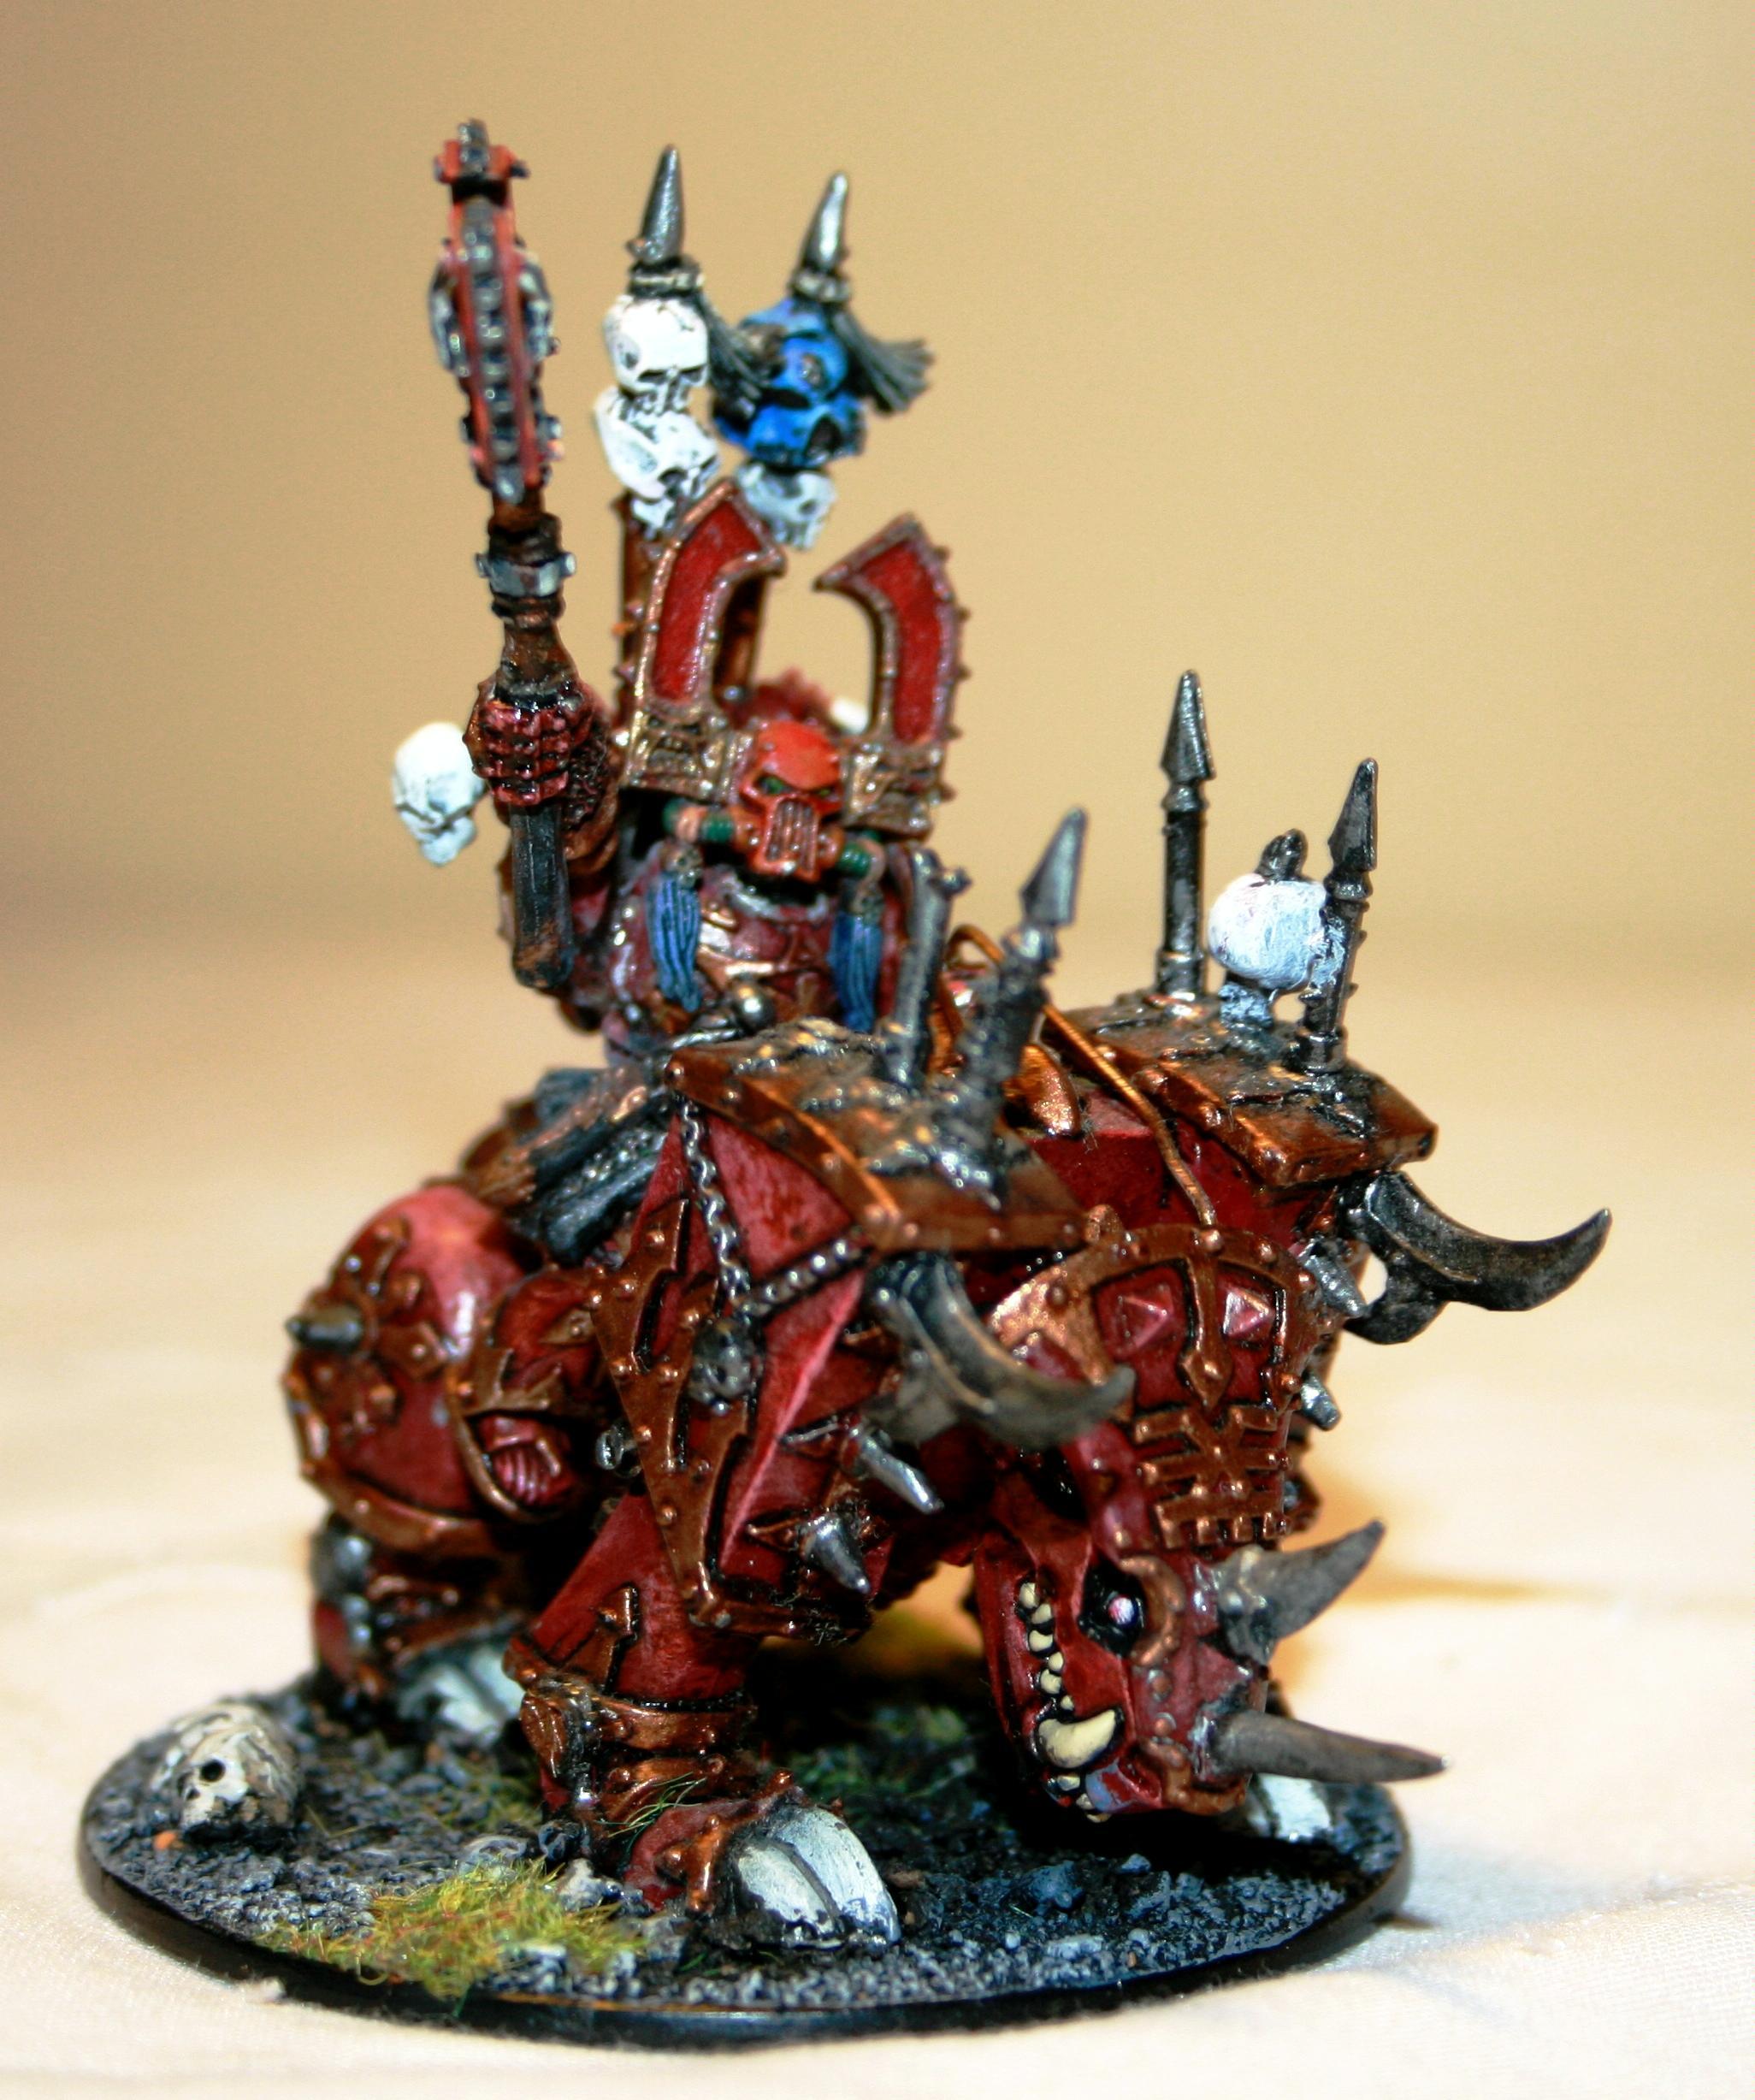 Champion, Chaos, Conversion, Daemons, Juggernaught, Kharne, Khorne